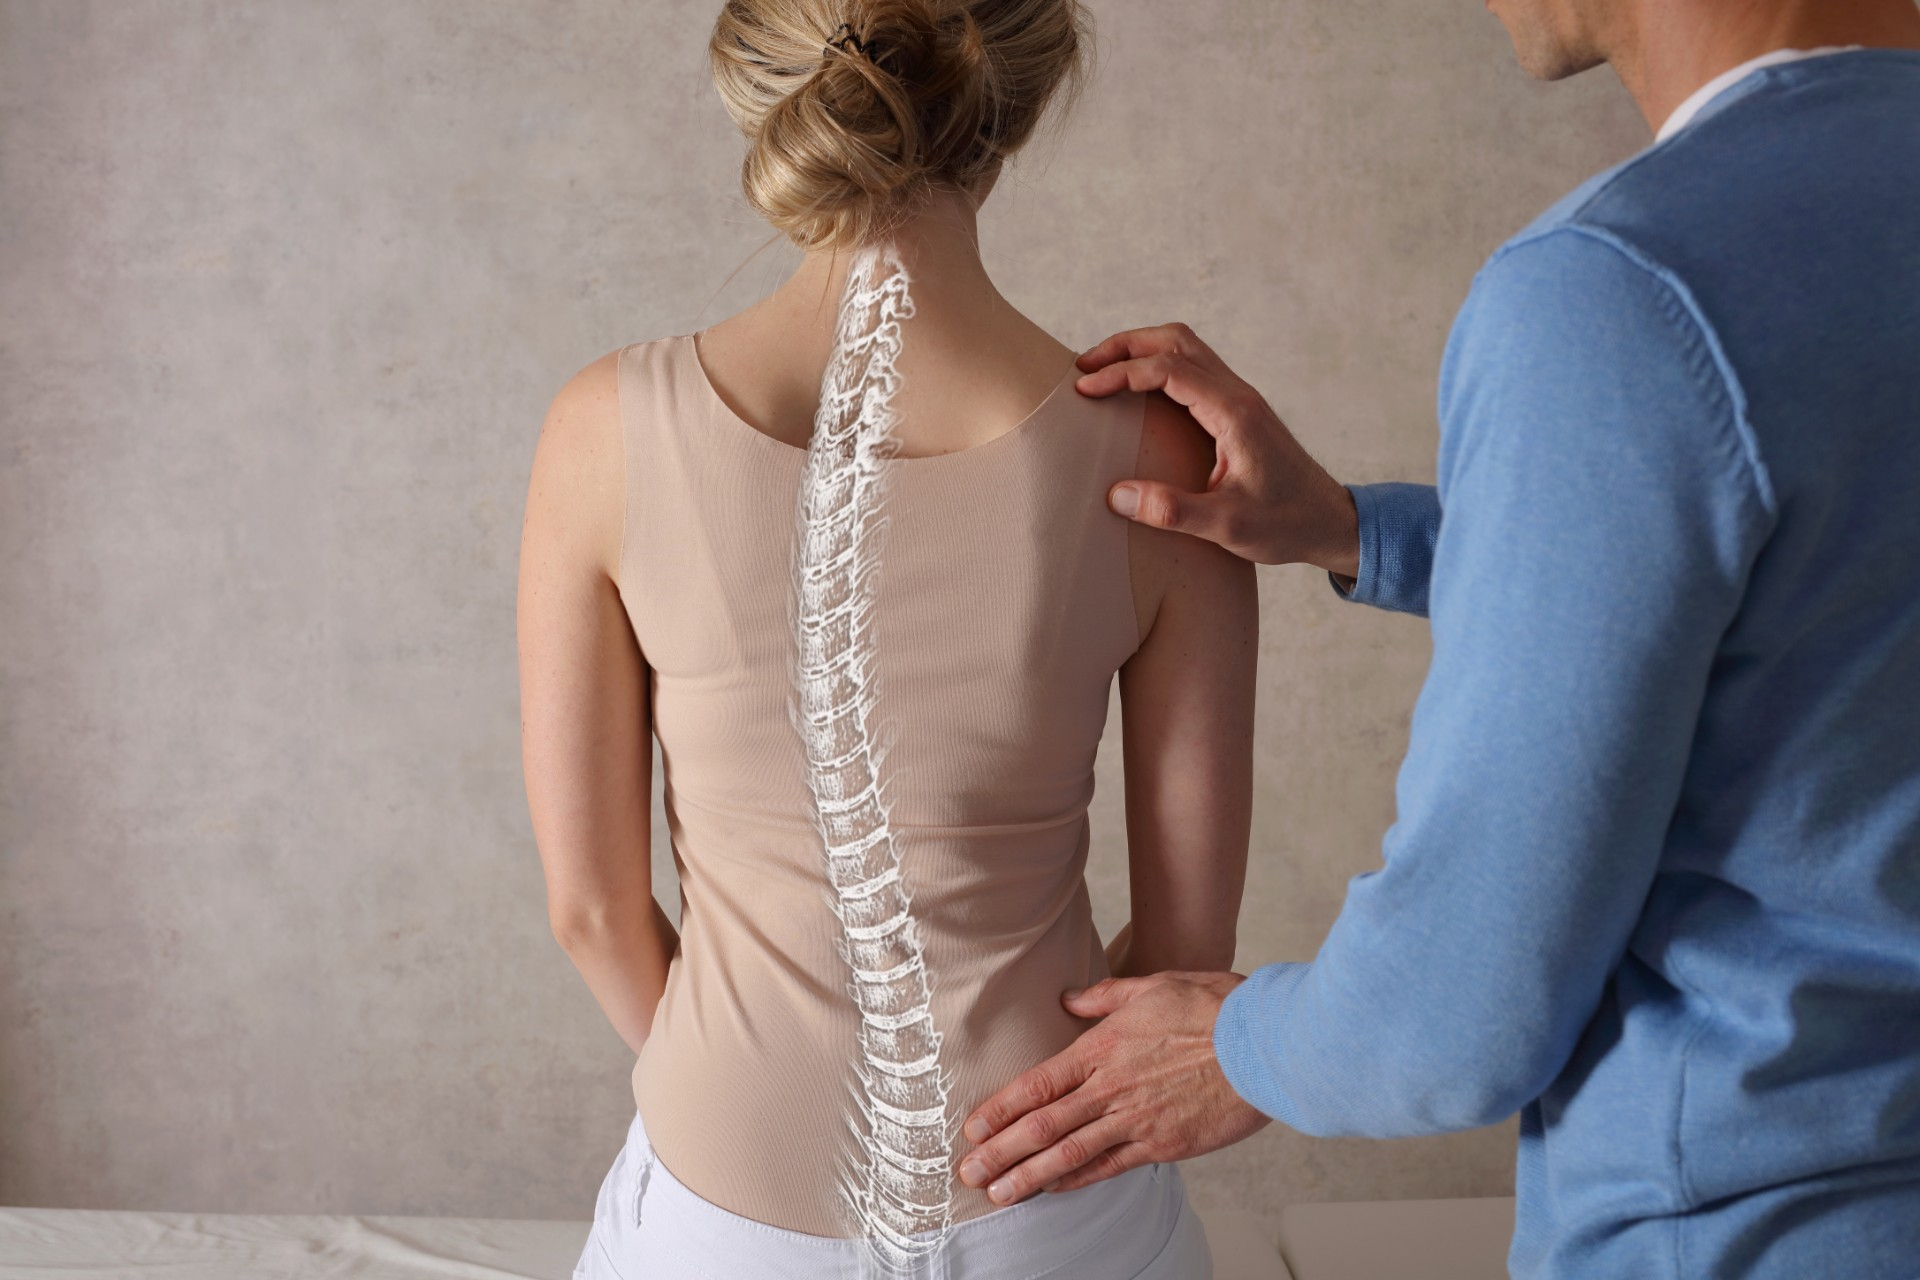 Orthopedic surgeon treating patient